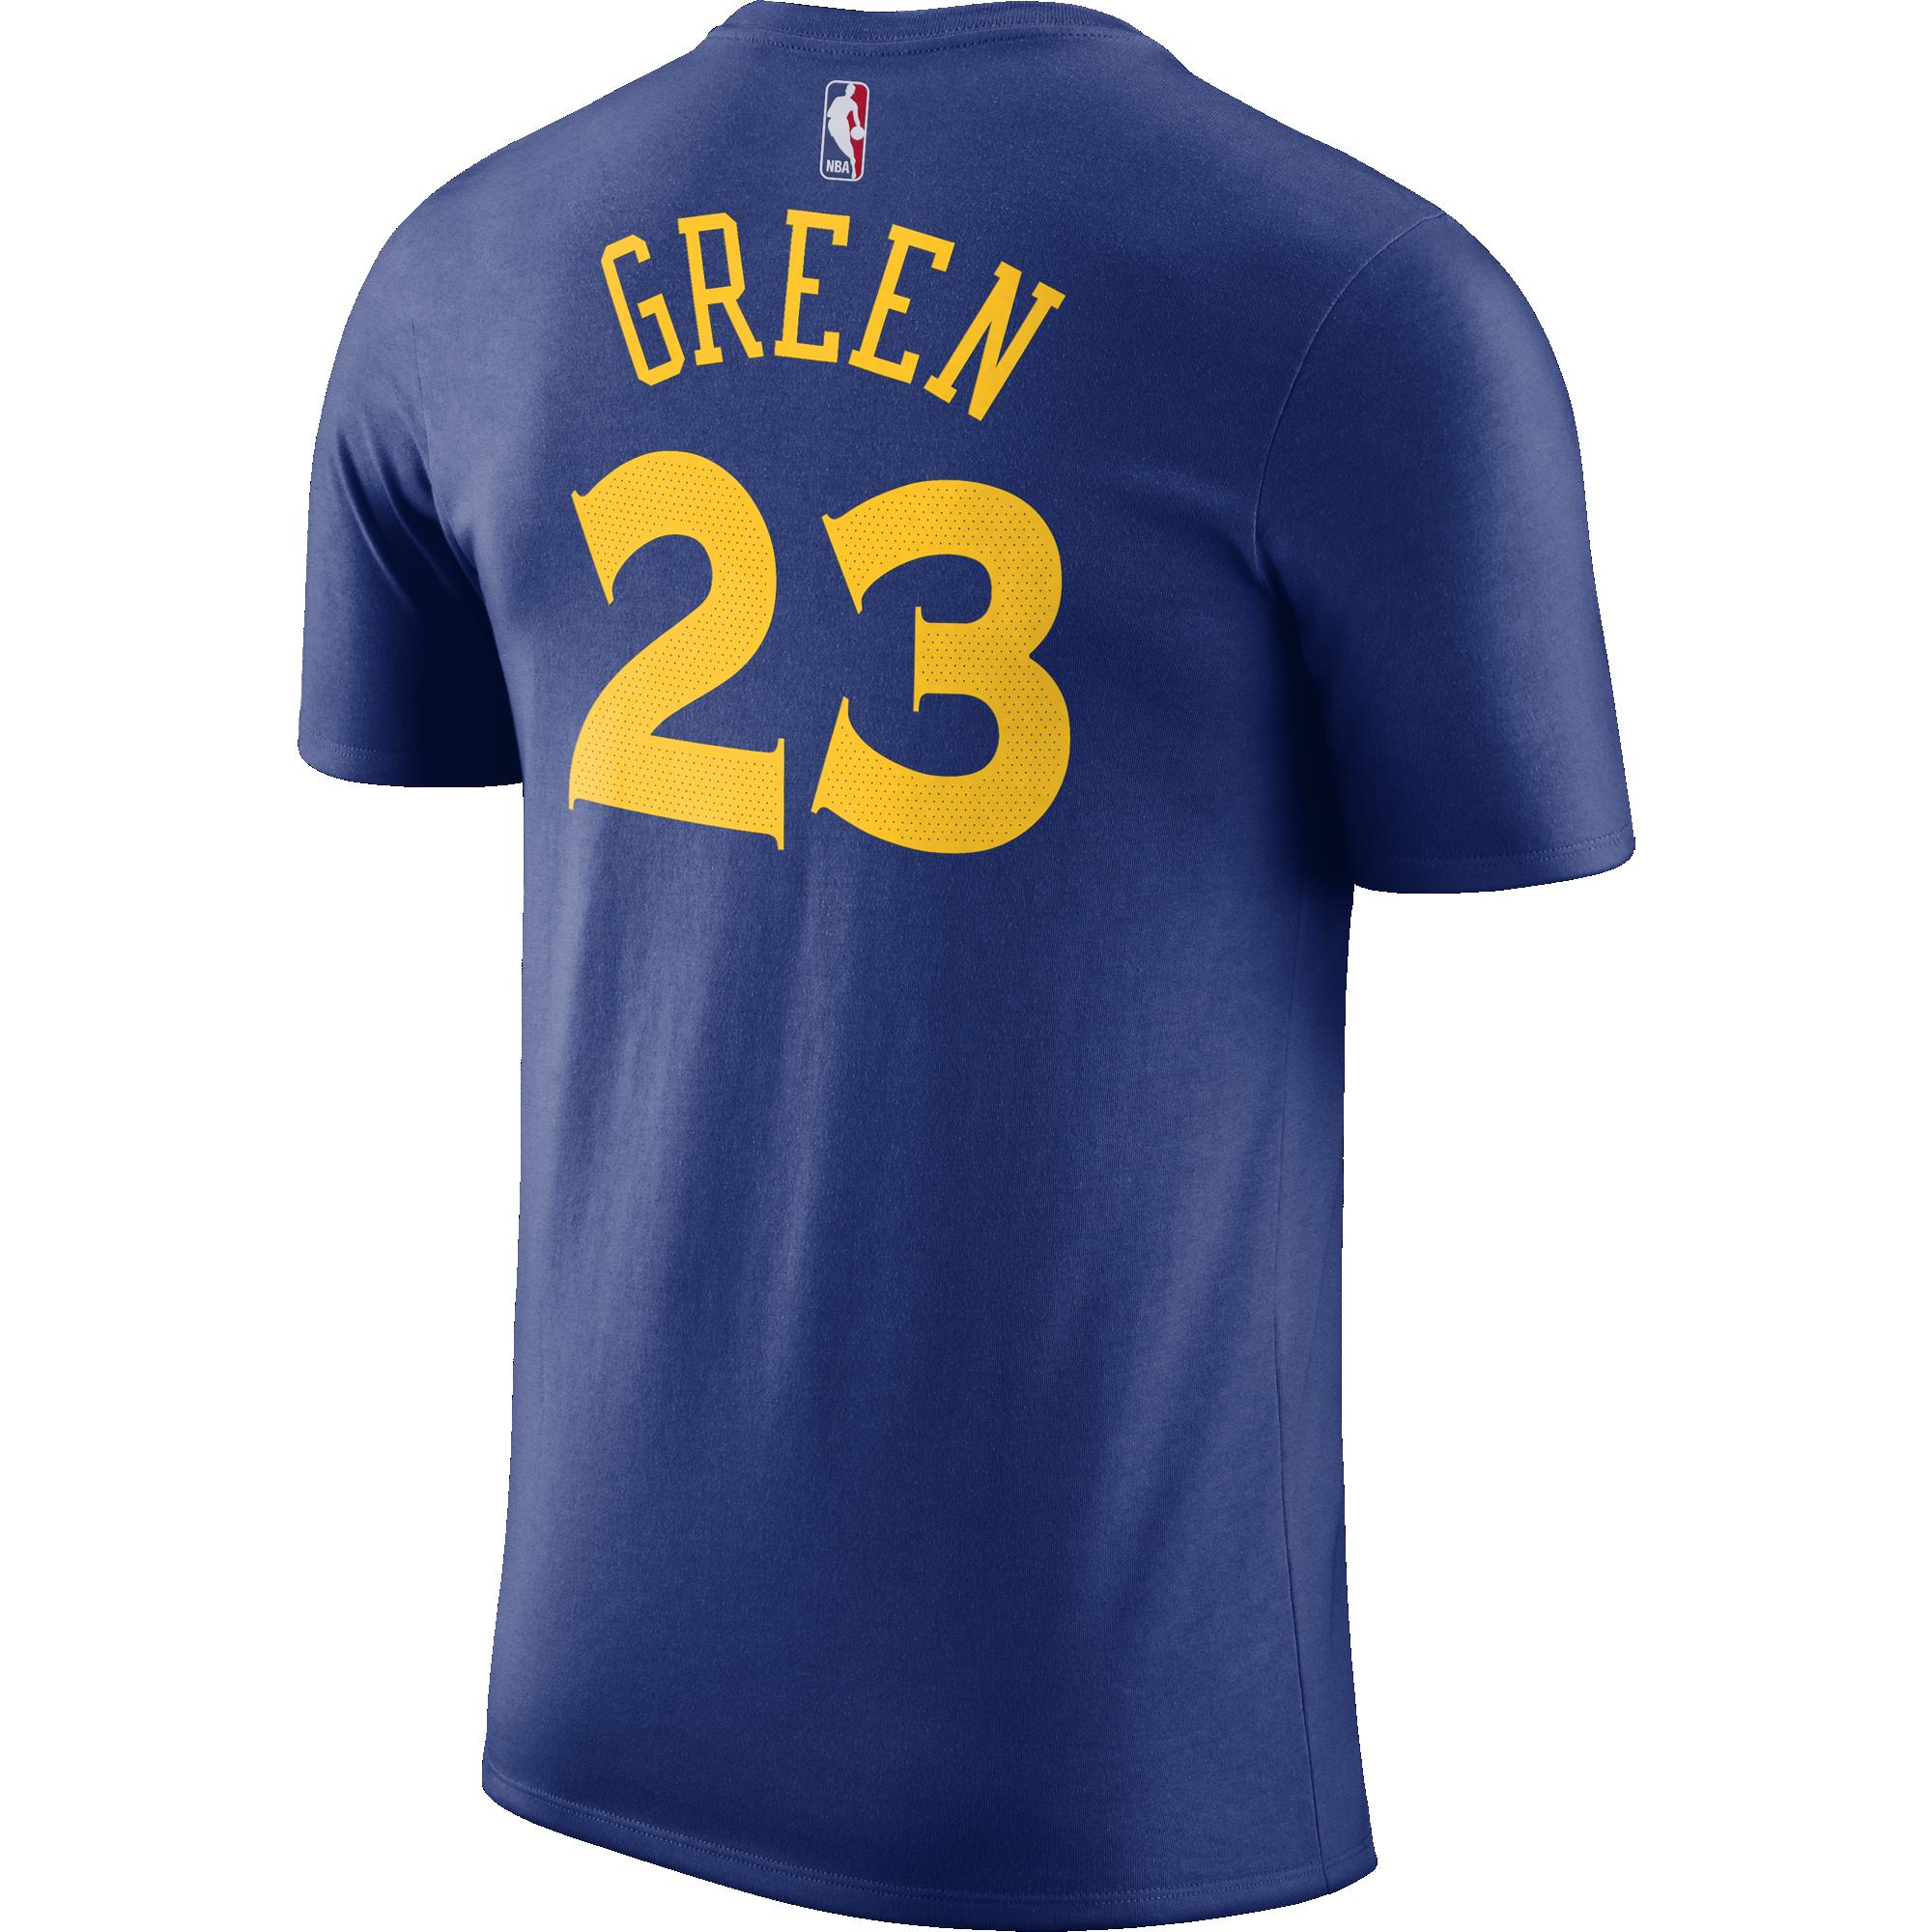 NIKE NBA GOLDEN STATE WARRIORS DRAYMOND GREEN DRY TEE